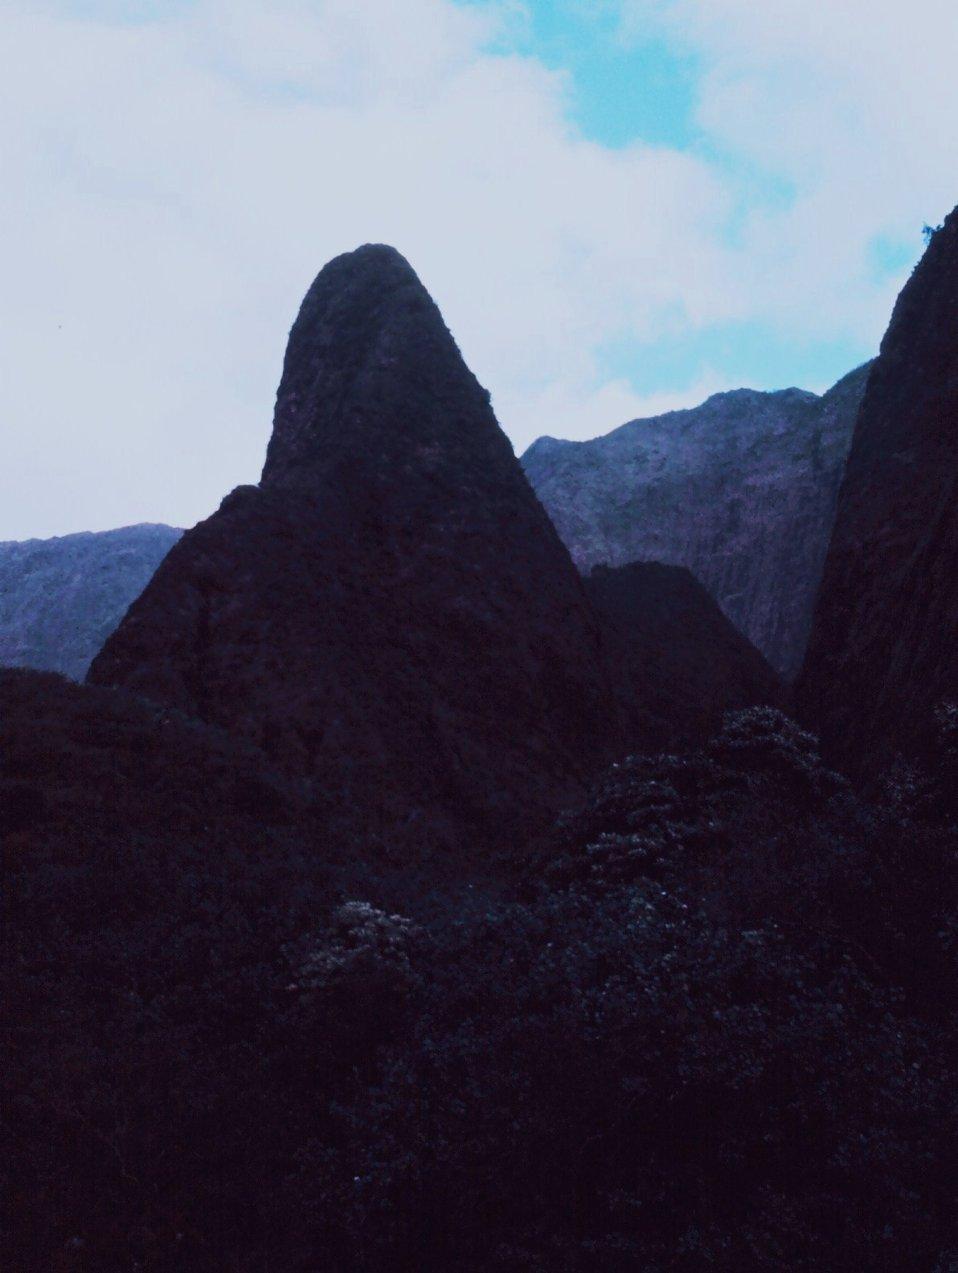 Lanai- Maui trip